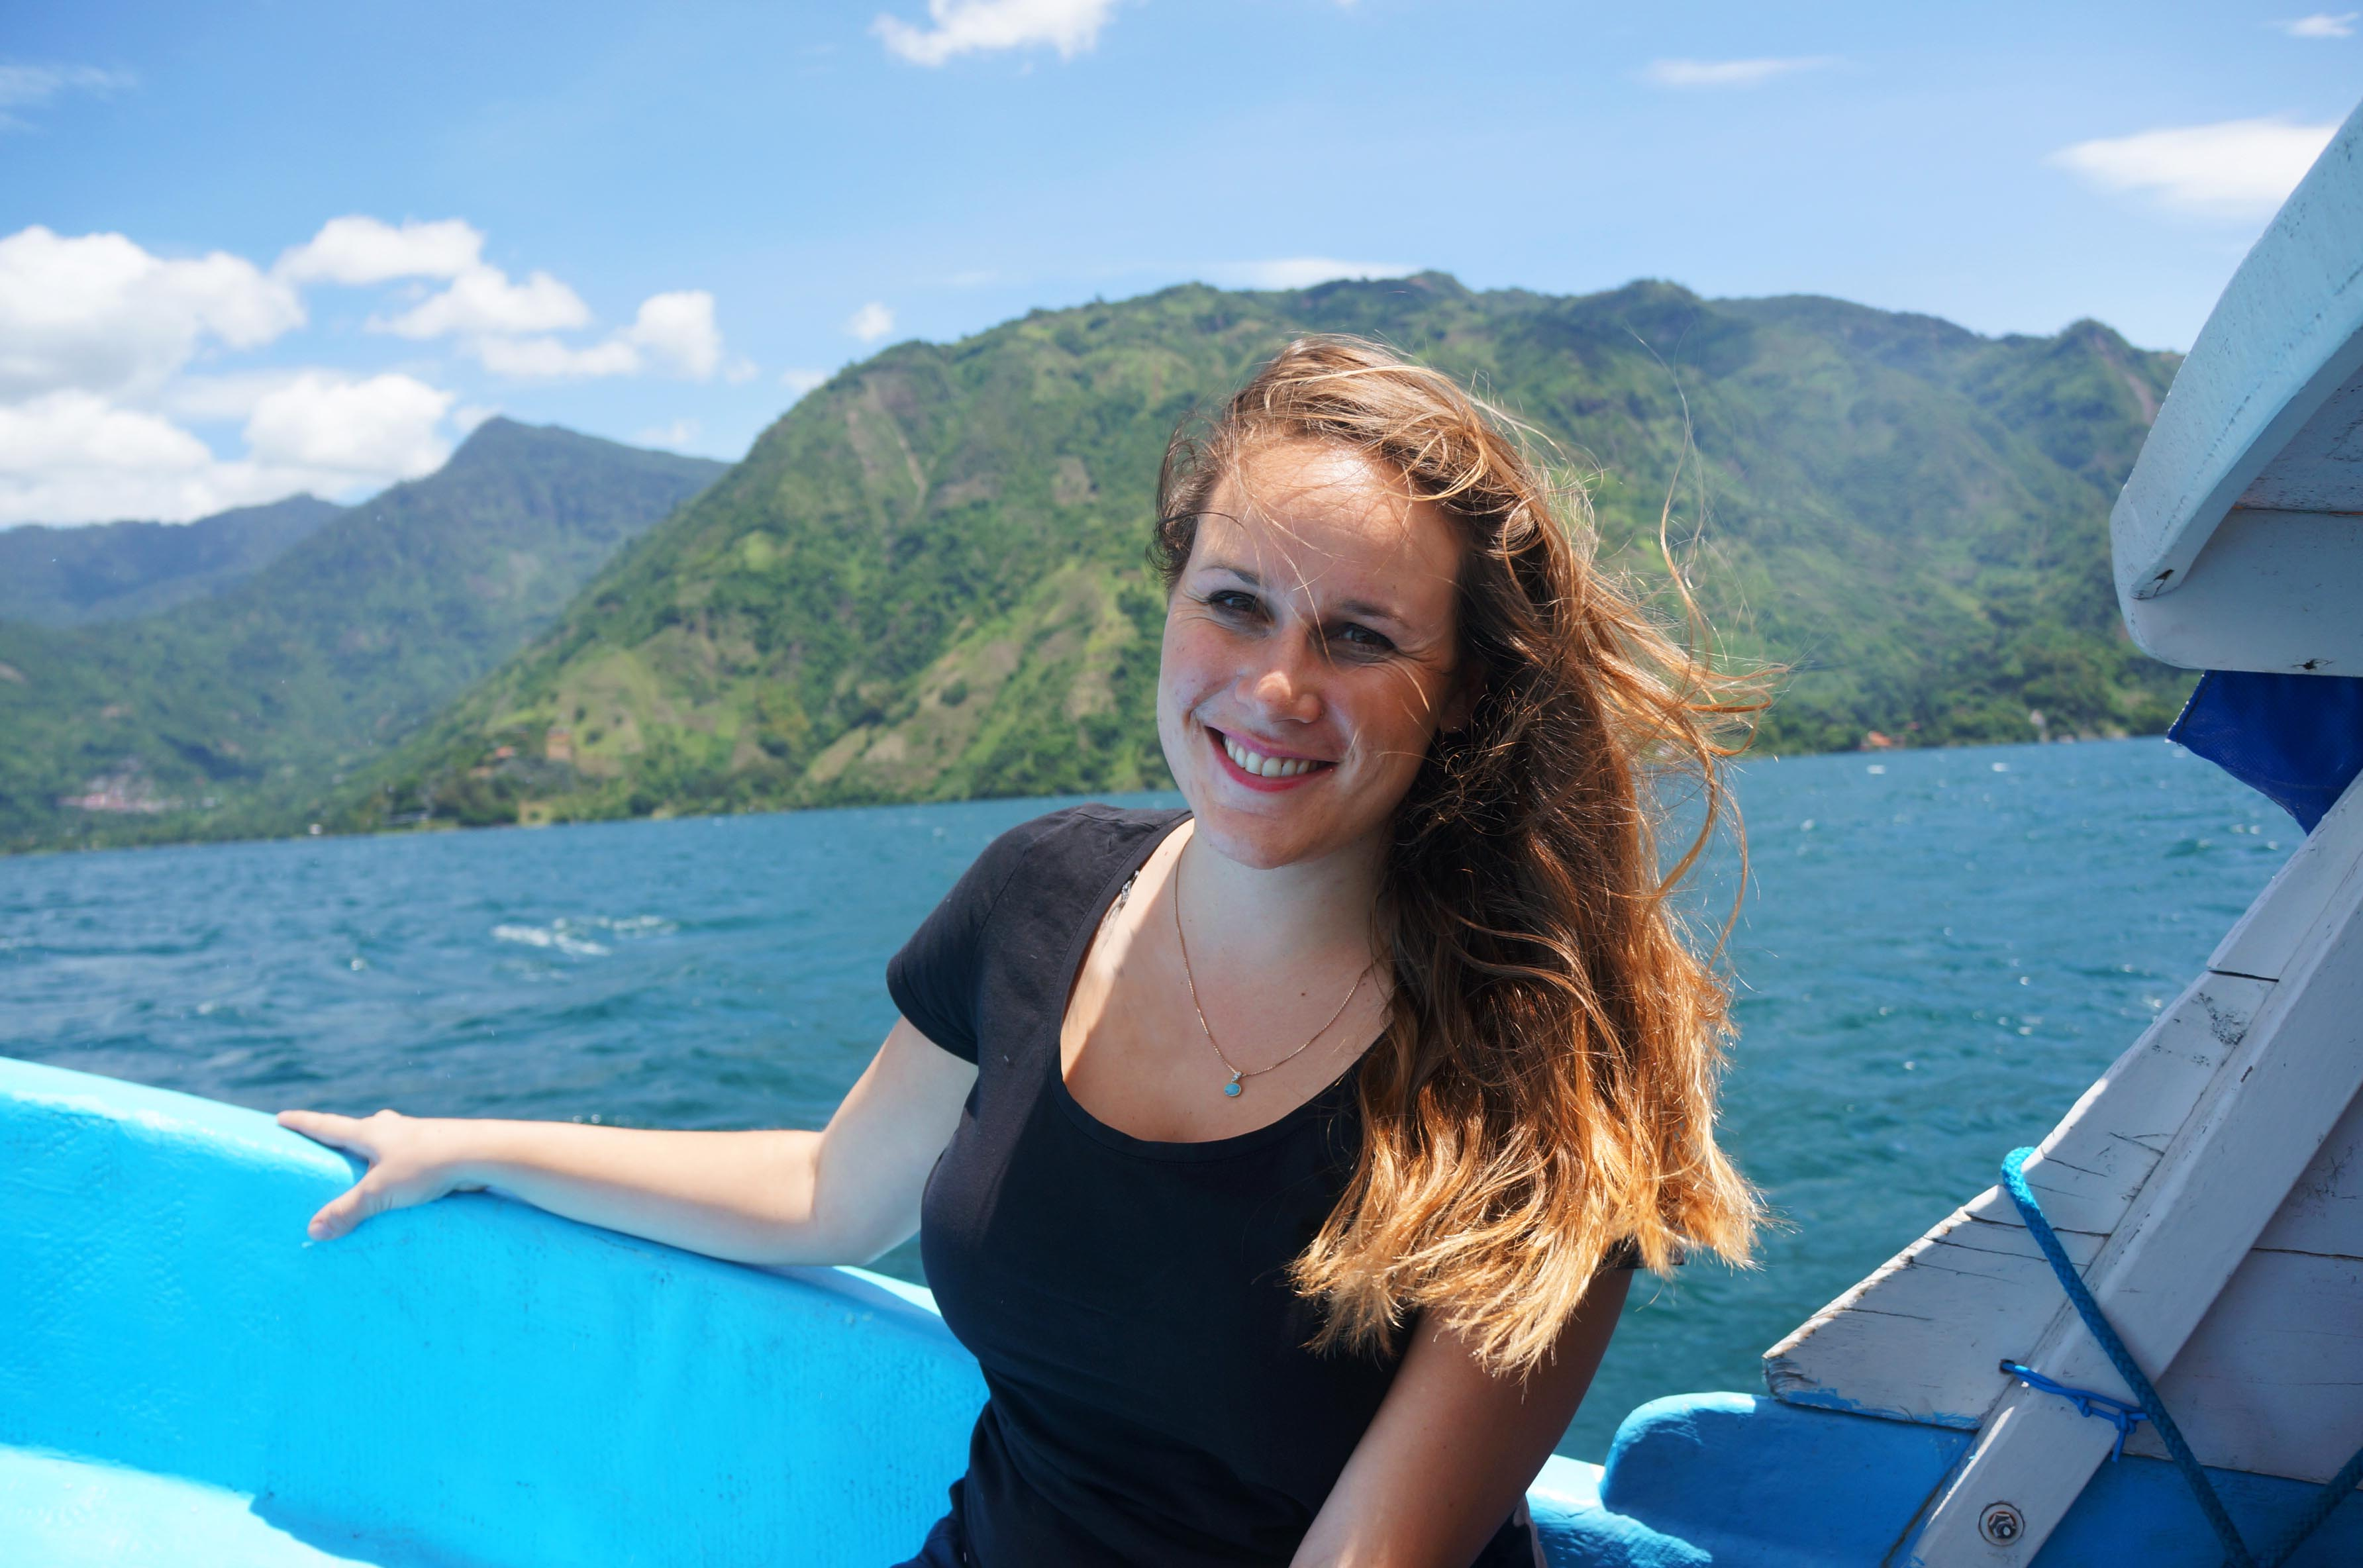 lauren salisbury takes a day trip to lake atitlan in guatemala